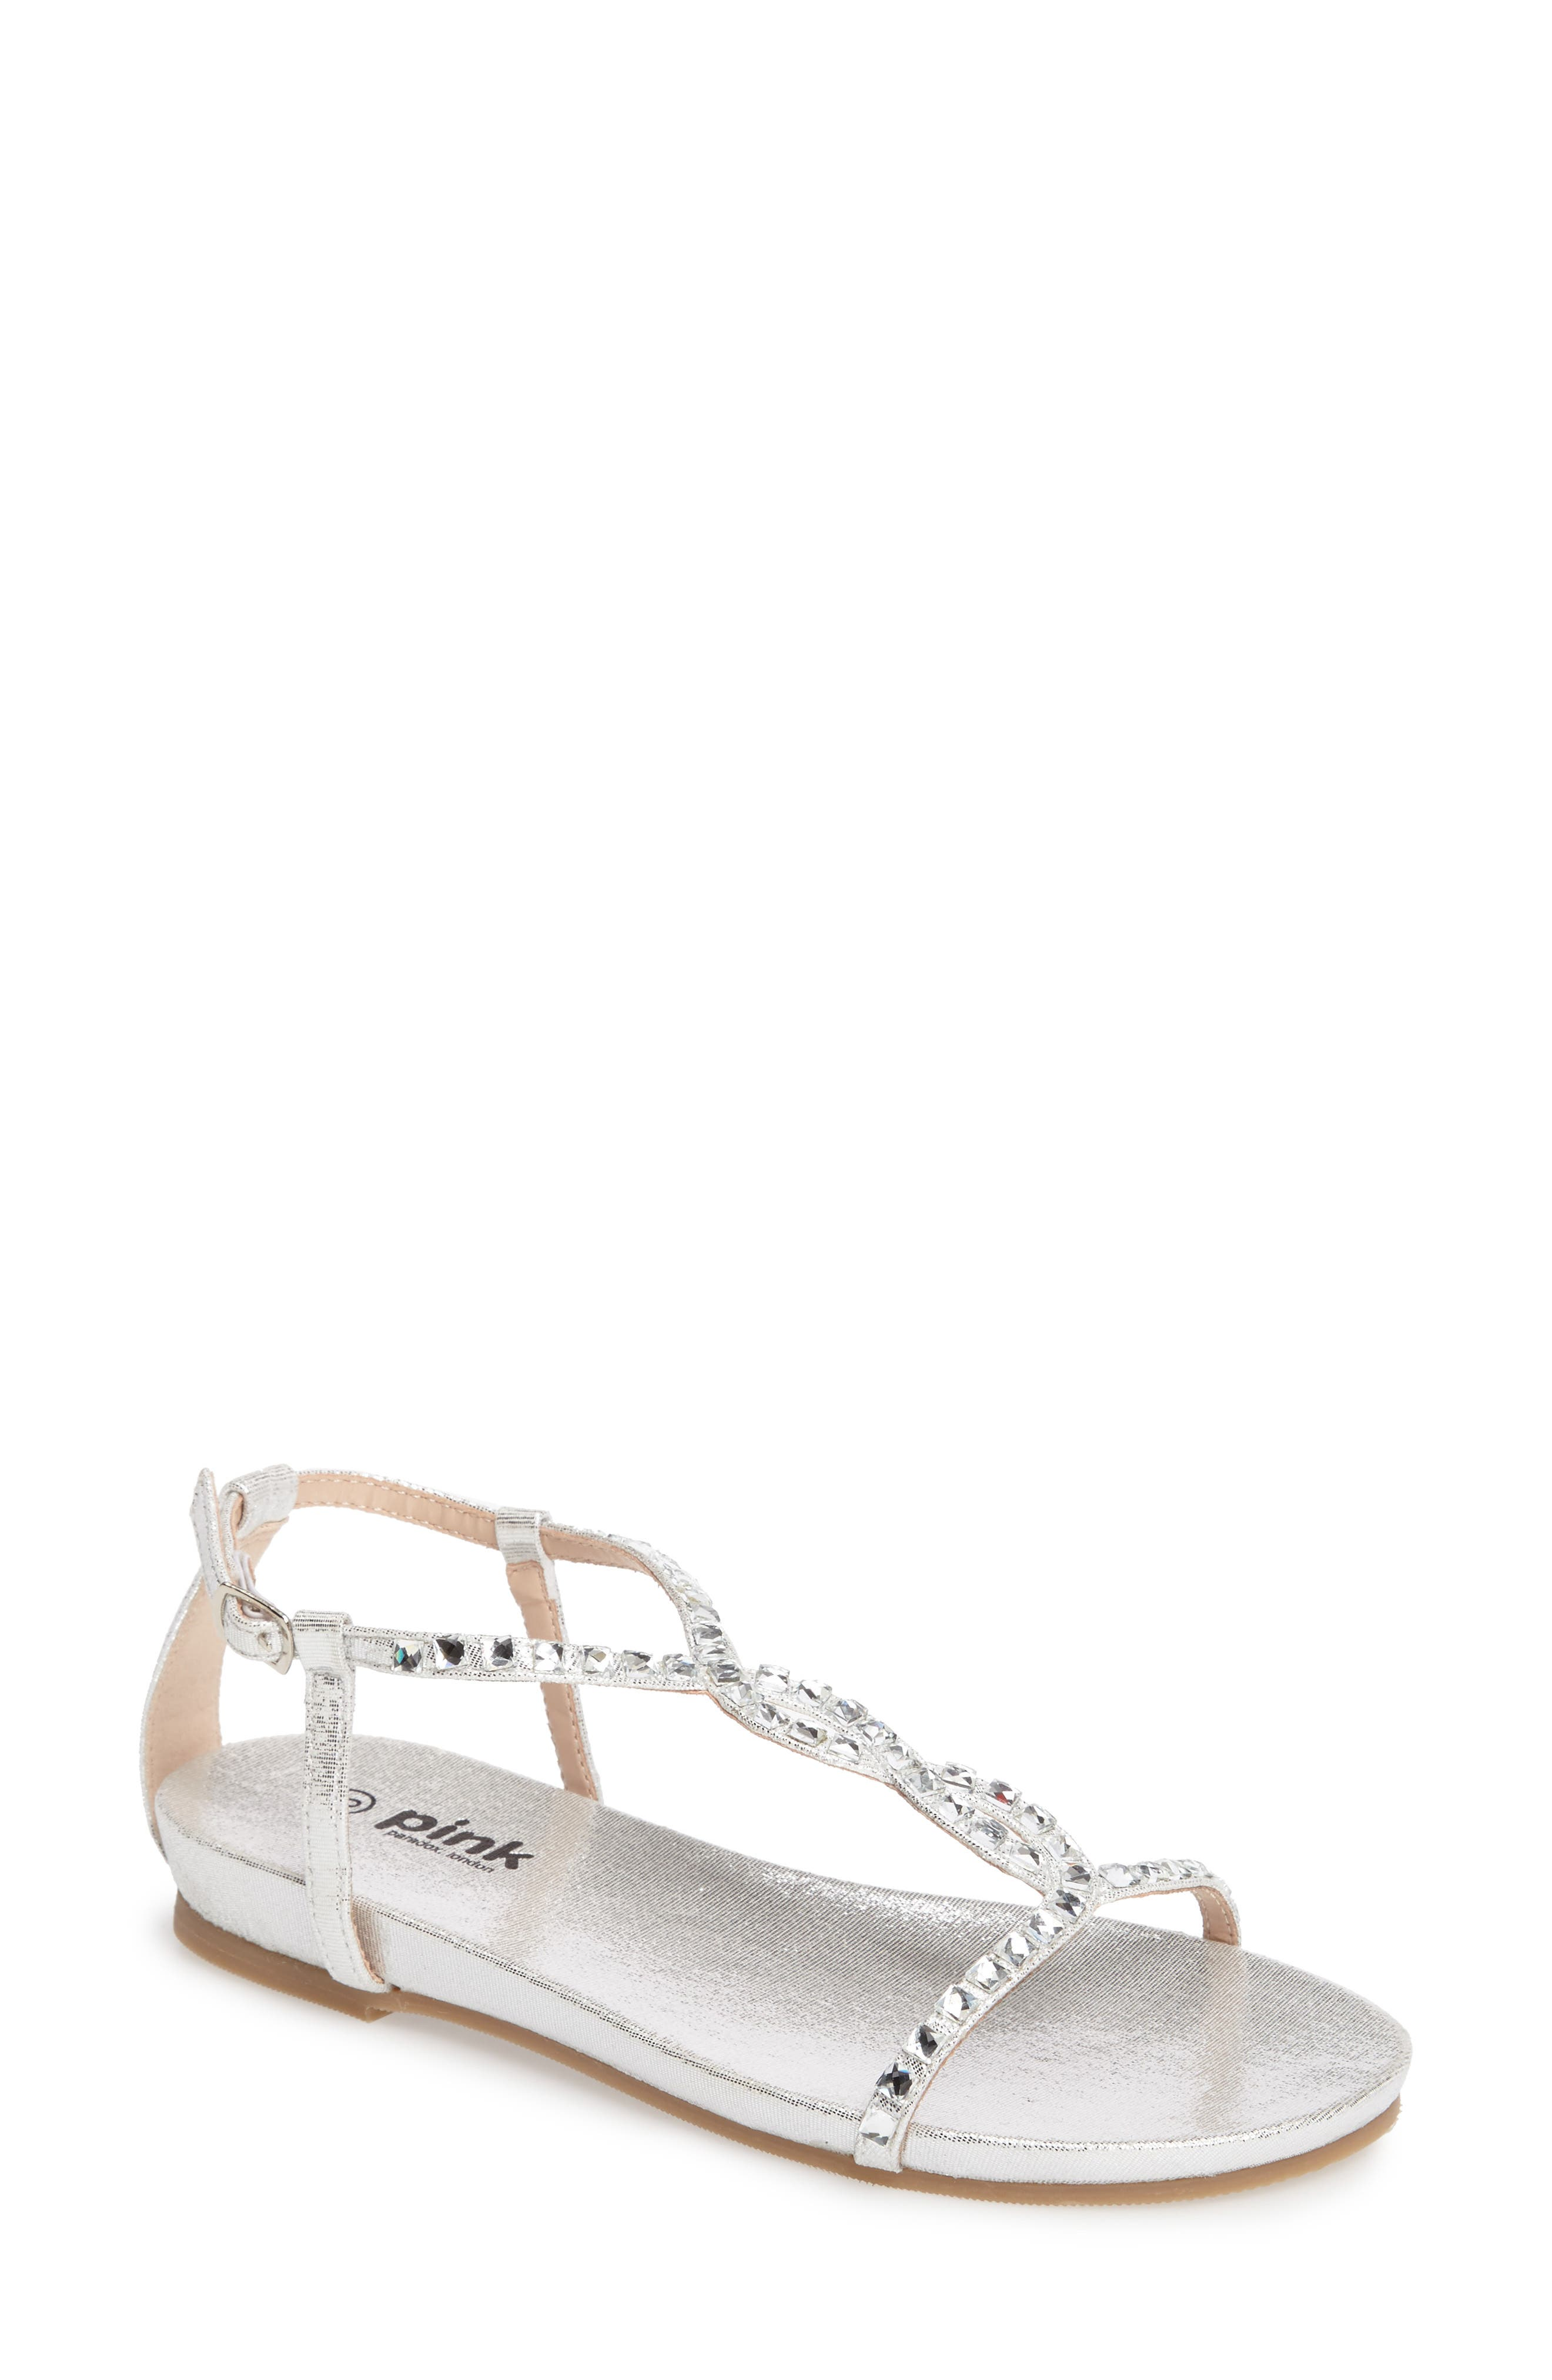 Kaylee Ankle Strap Sandal,                         Main,                         color, SILVER